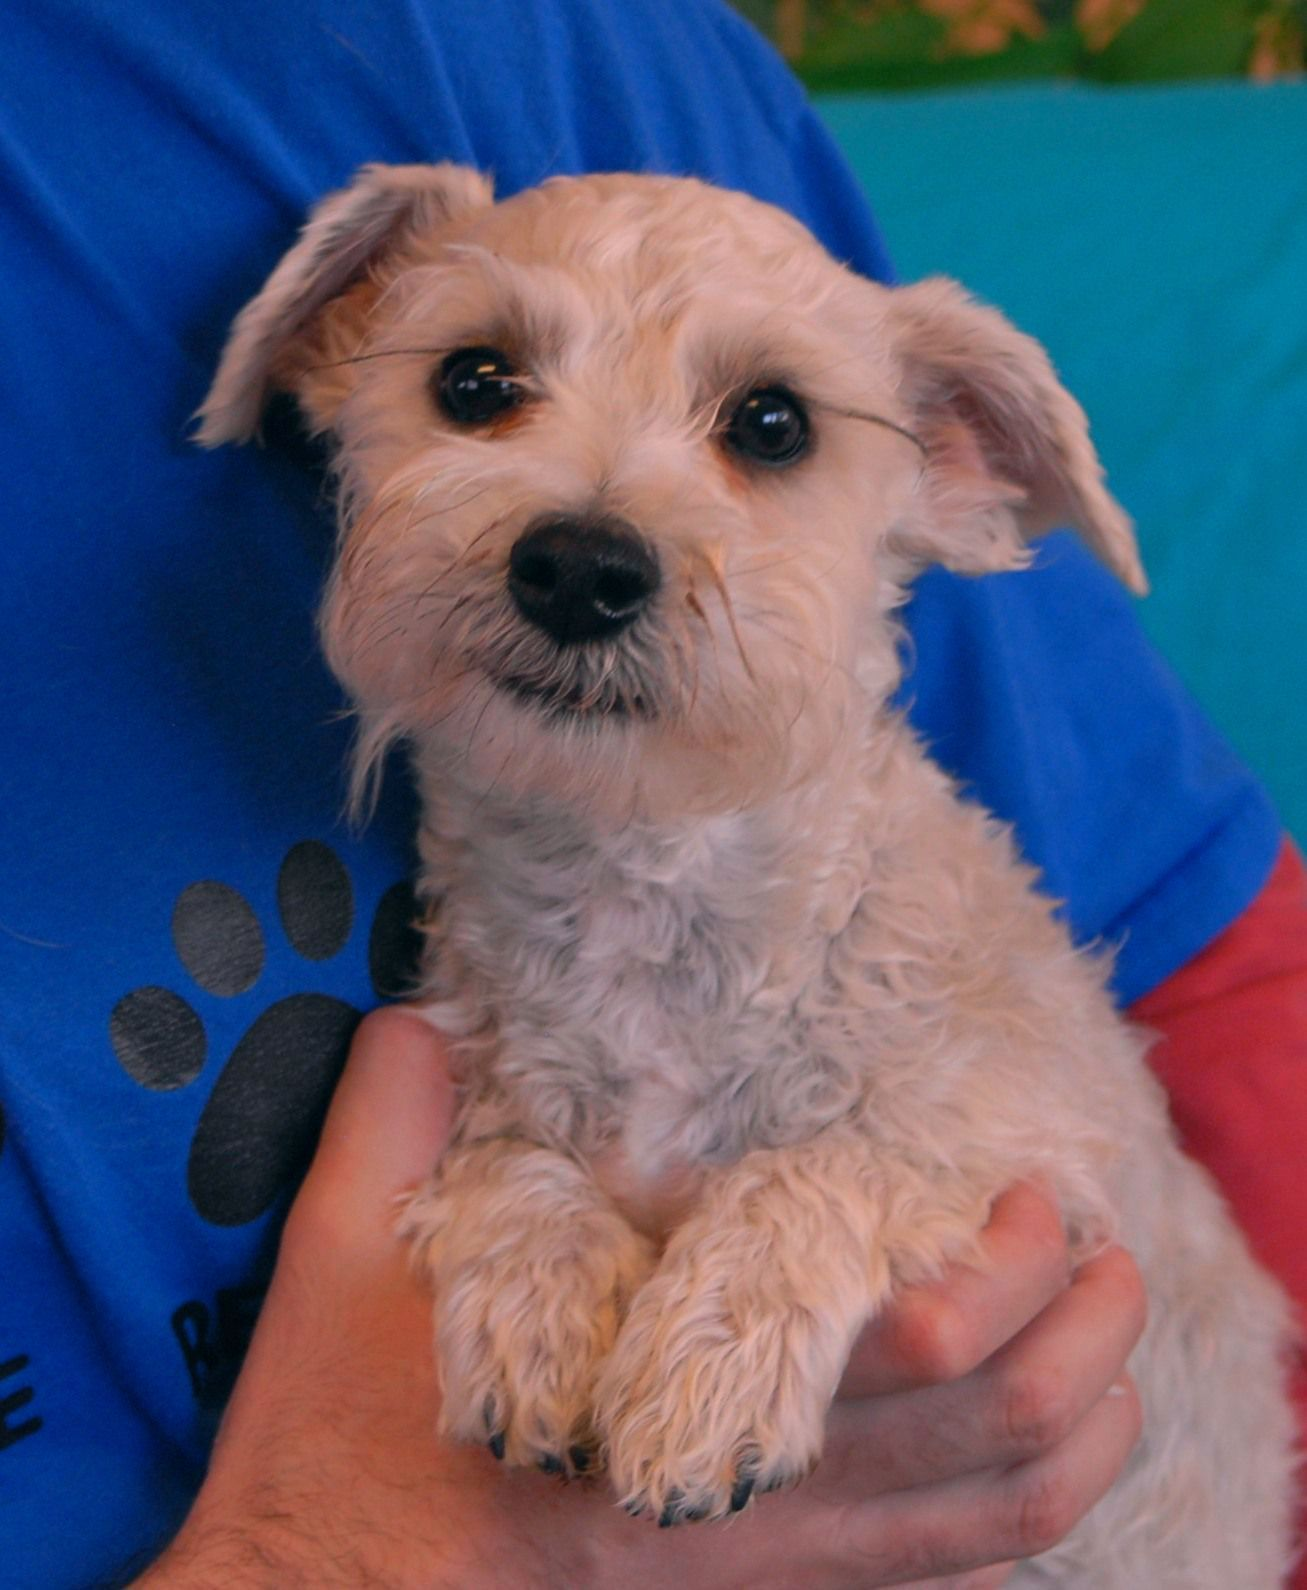 Schnauzer Maltese Mix Puppies For Sale Goldenacresdogs Com Schnauzer Mini Puppies For Sale Puppy Adoption Mauzer M In 2020 Schnauzer Mix Cute Small Dogs Mini Puppies